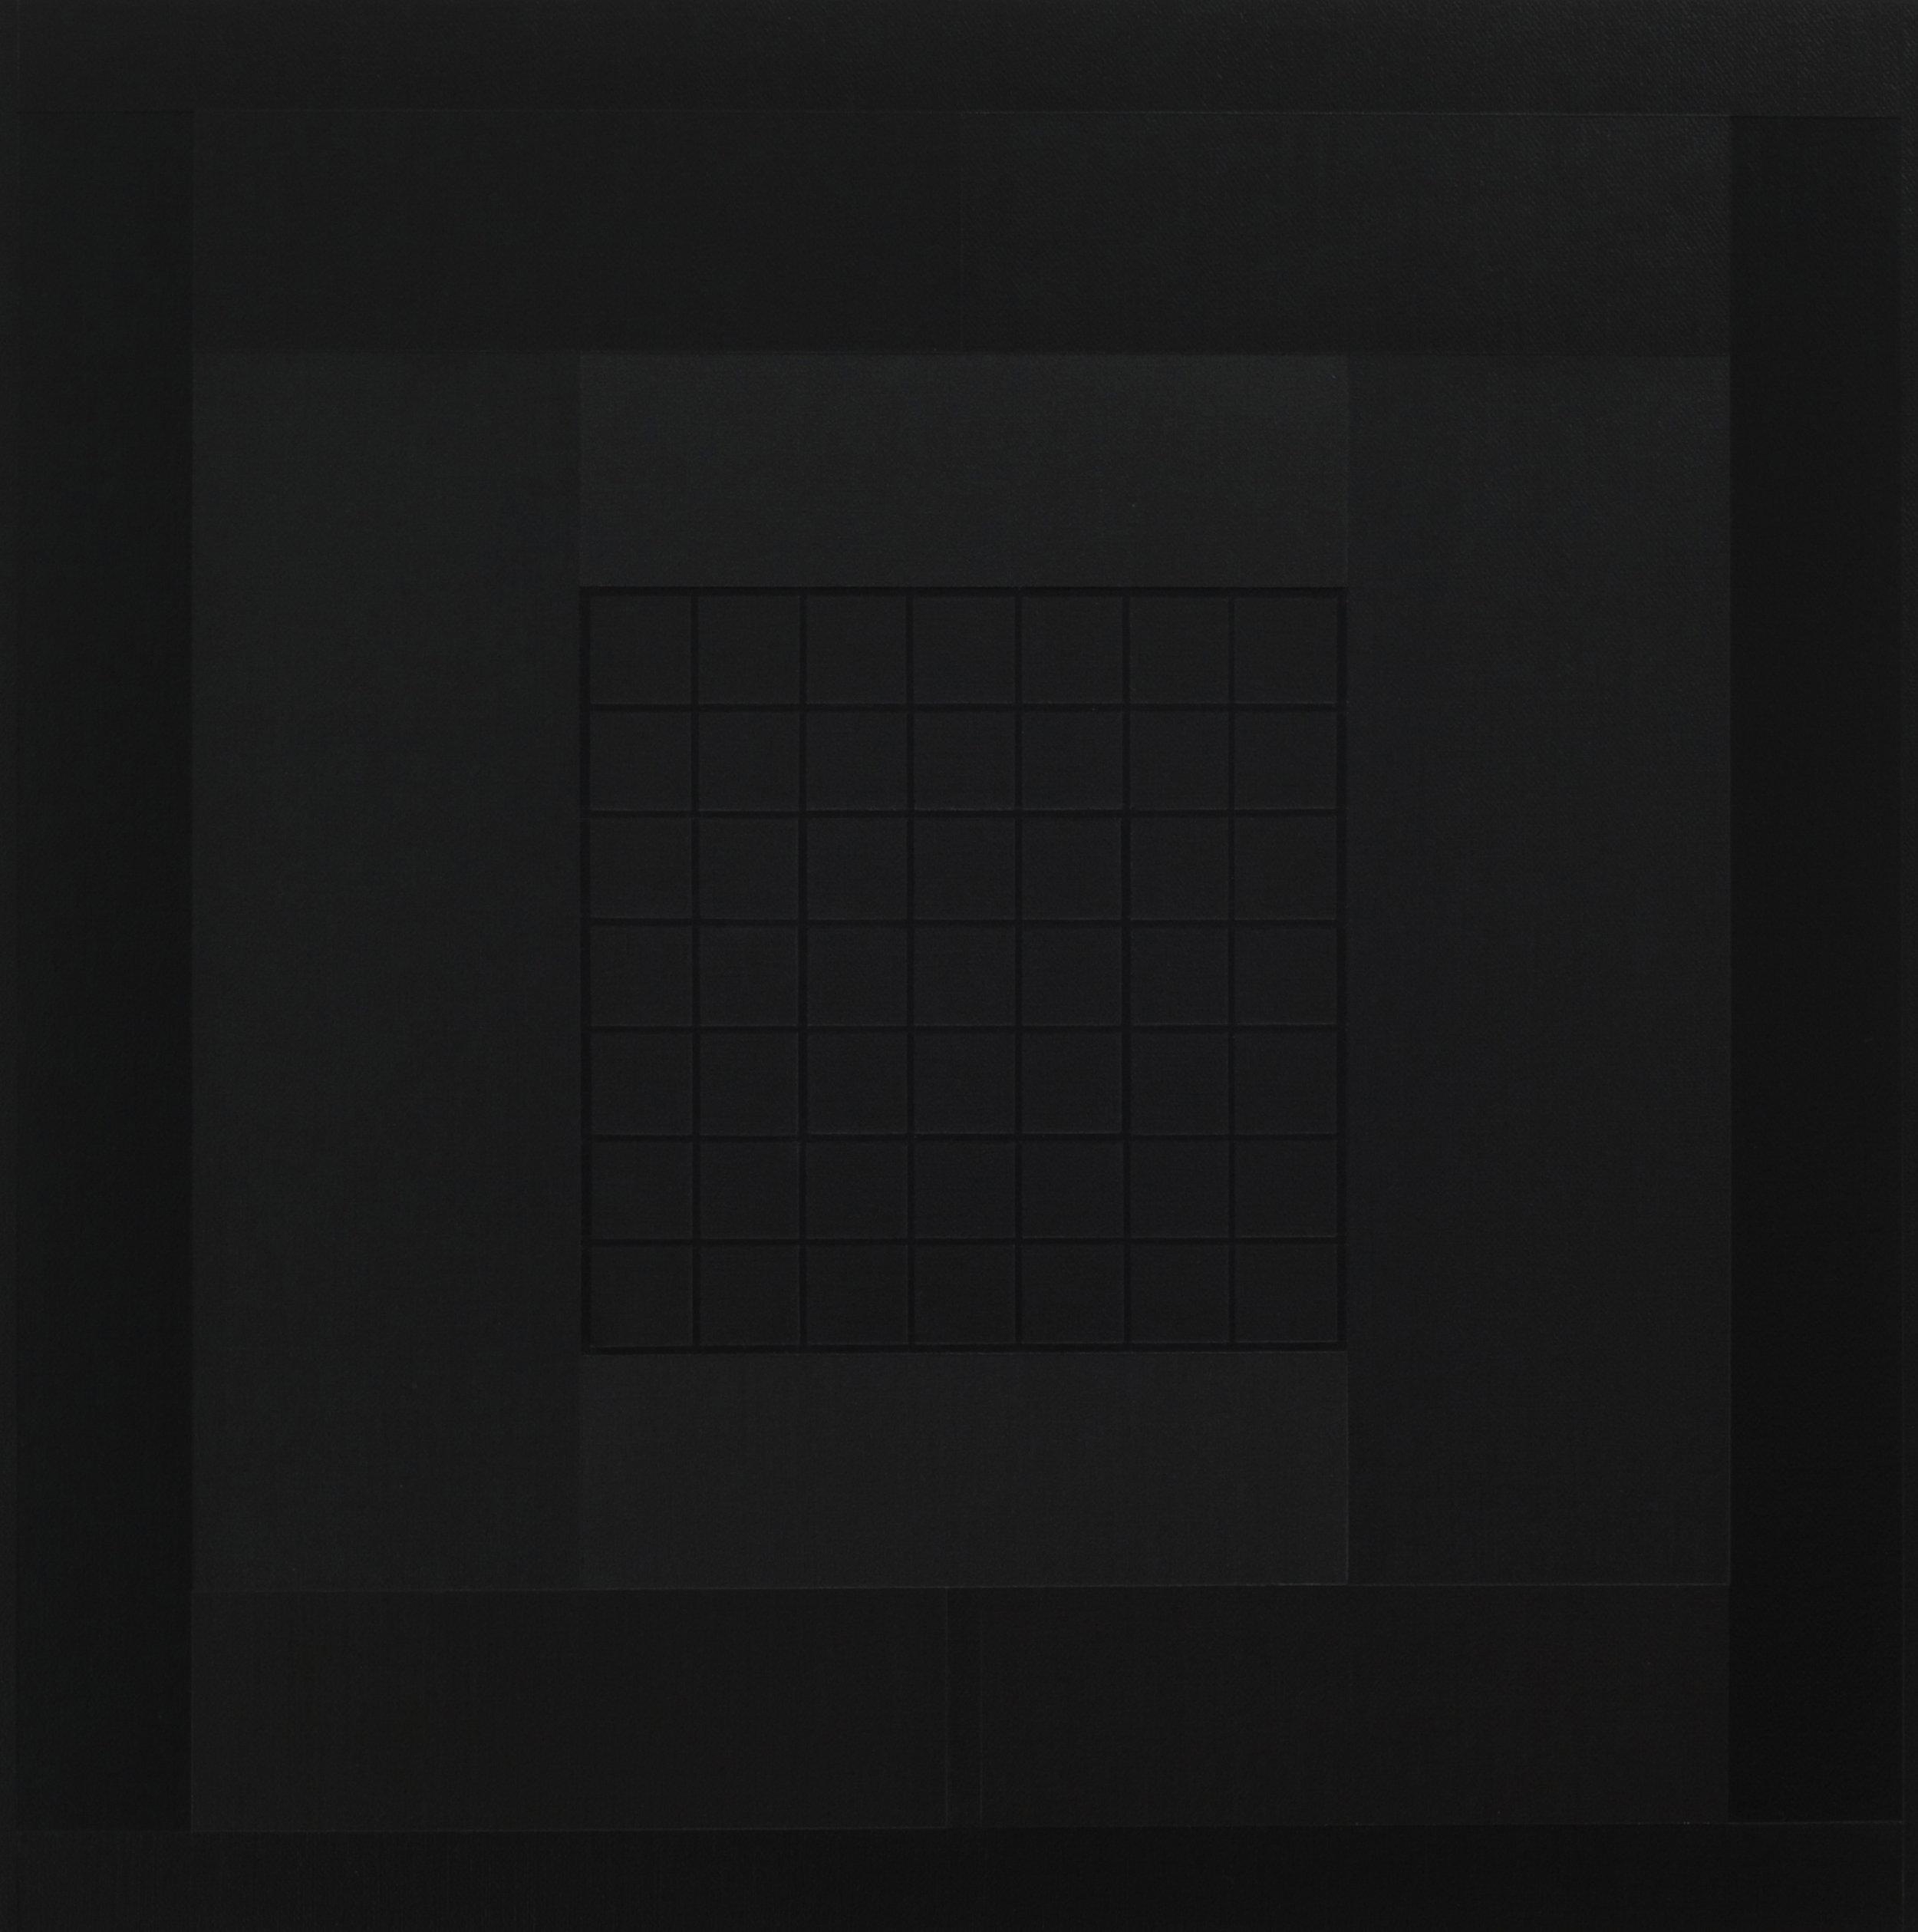 Yantra-ipsum-arkhē(1)2011.Jan, acrylic on canvas, 17 3/4 x 17 3/4 in. [45x45cm]